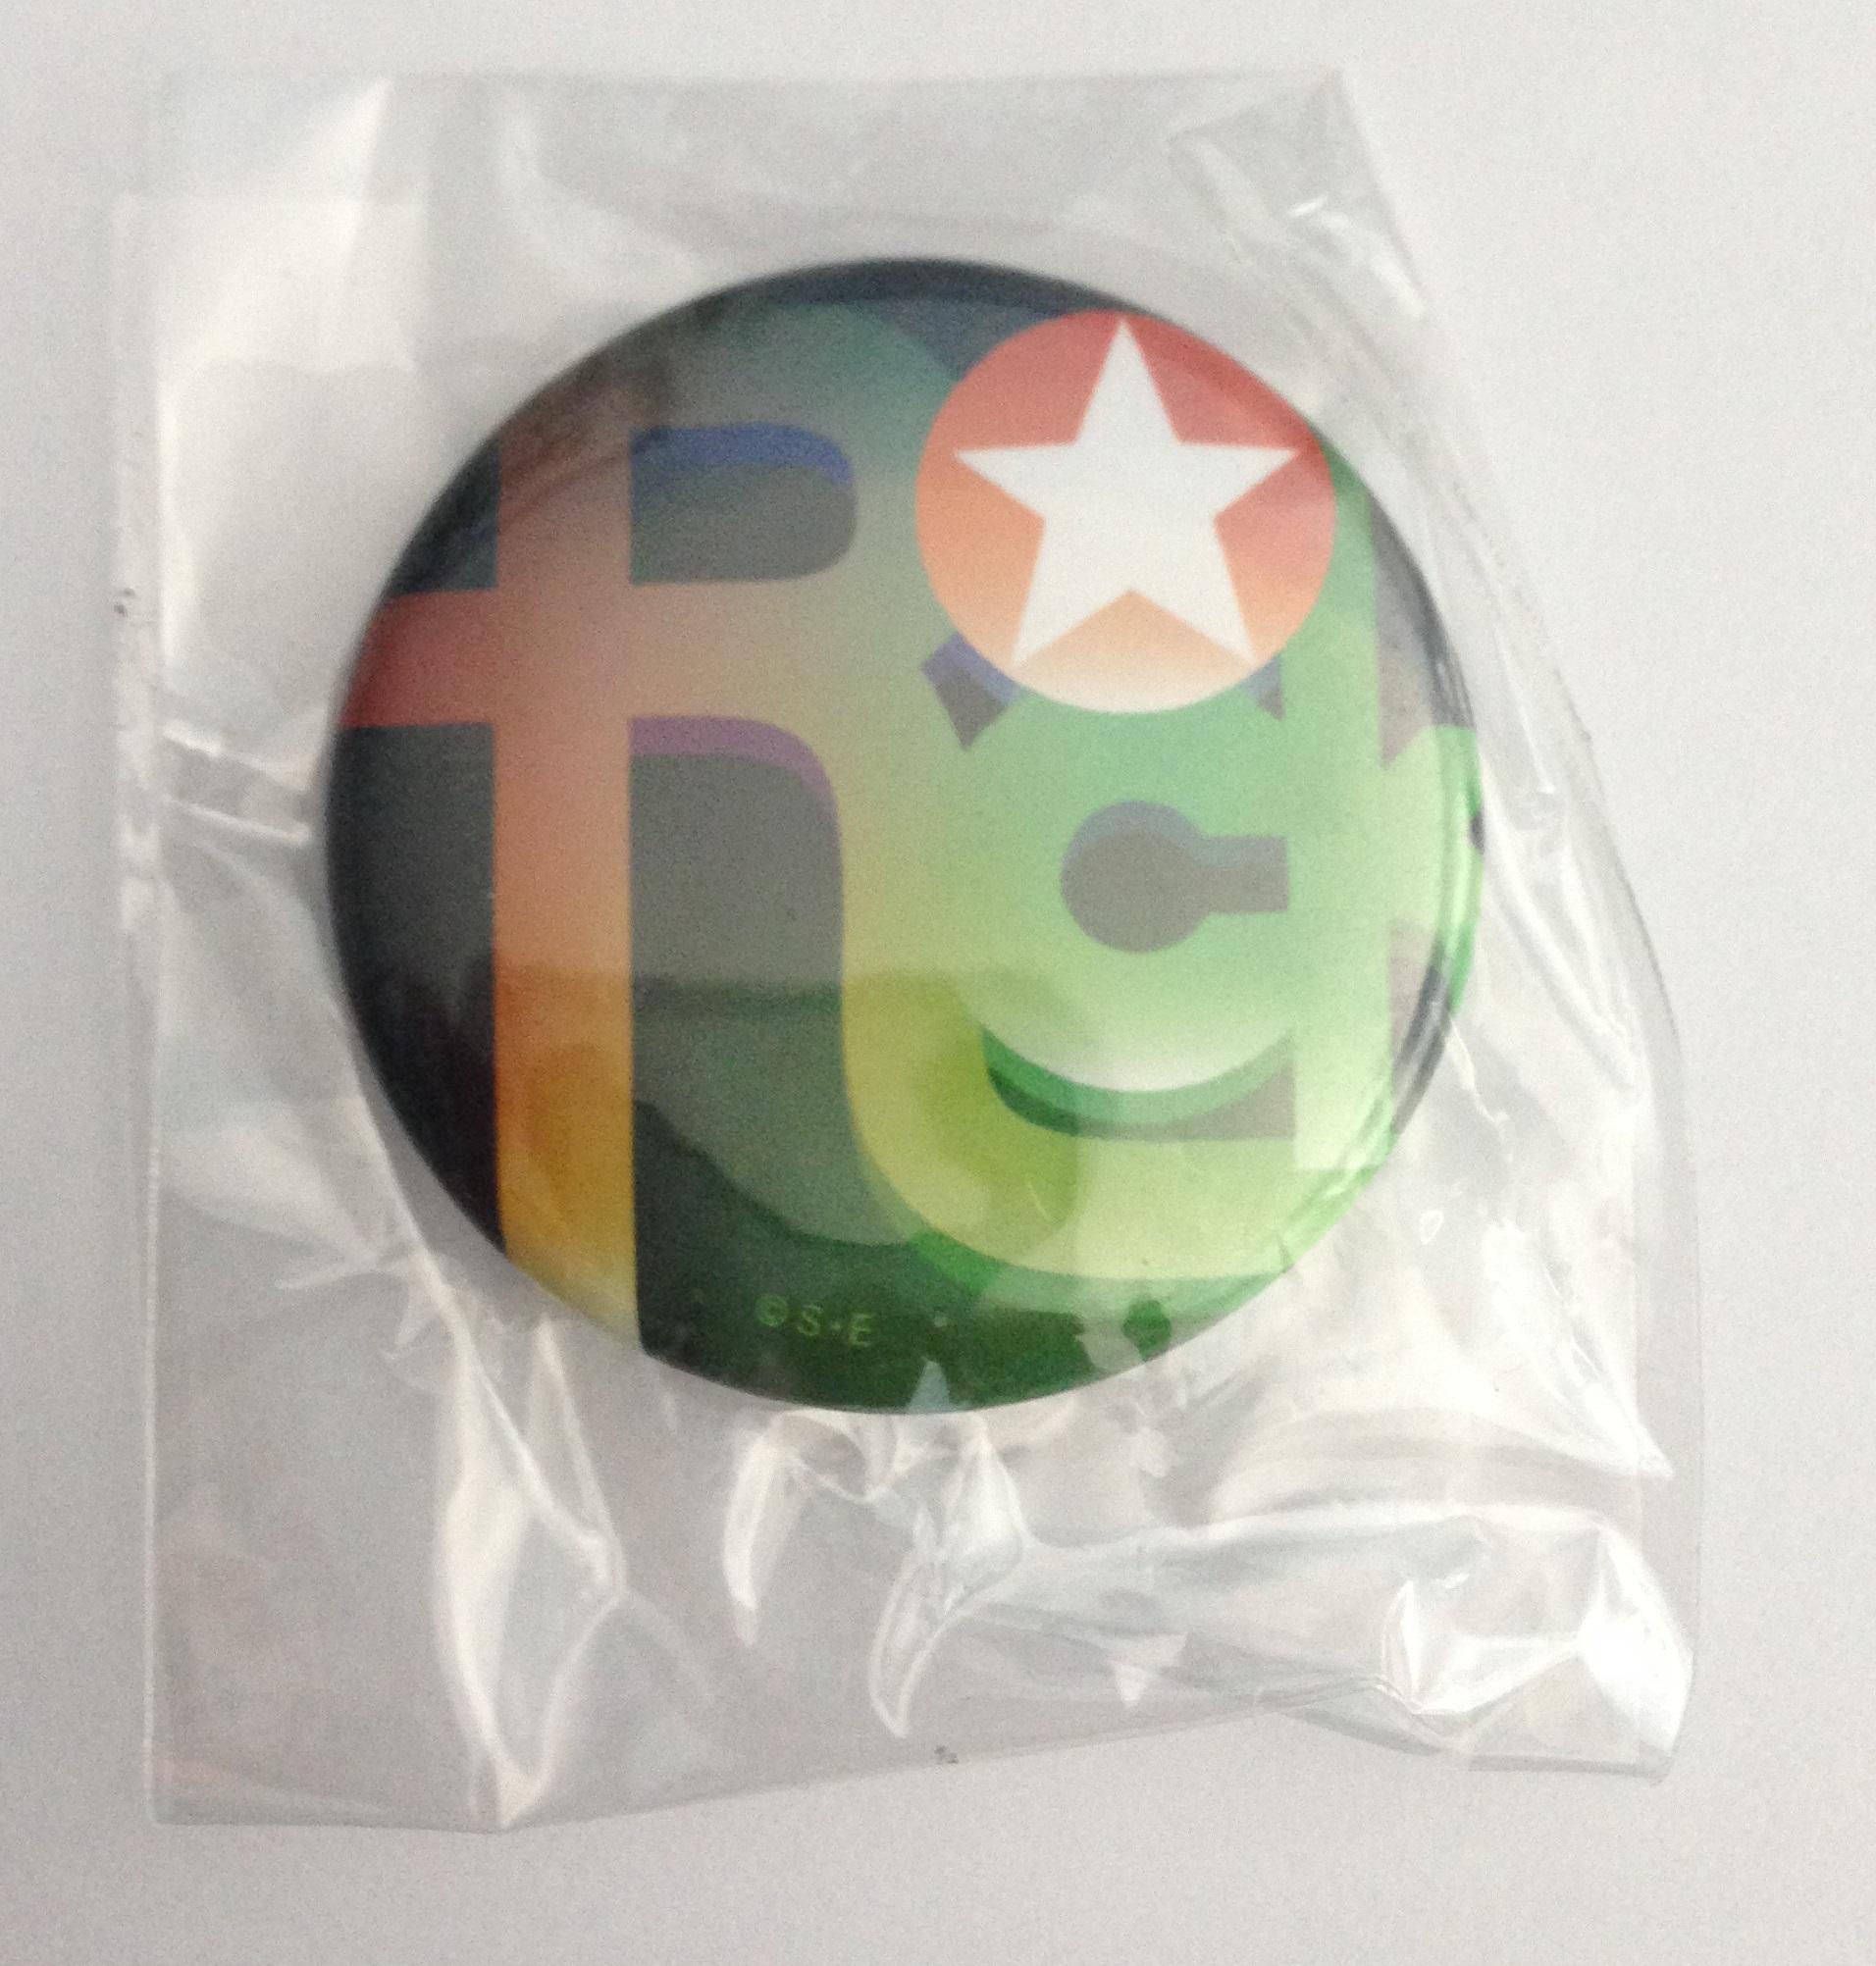 square_enix badge jupiter subarashiki_kono_sekai subarashiki_kono_sekai_pin_badge_collection_vol._1